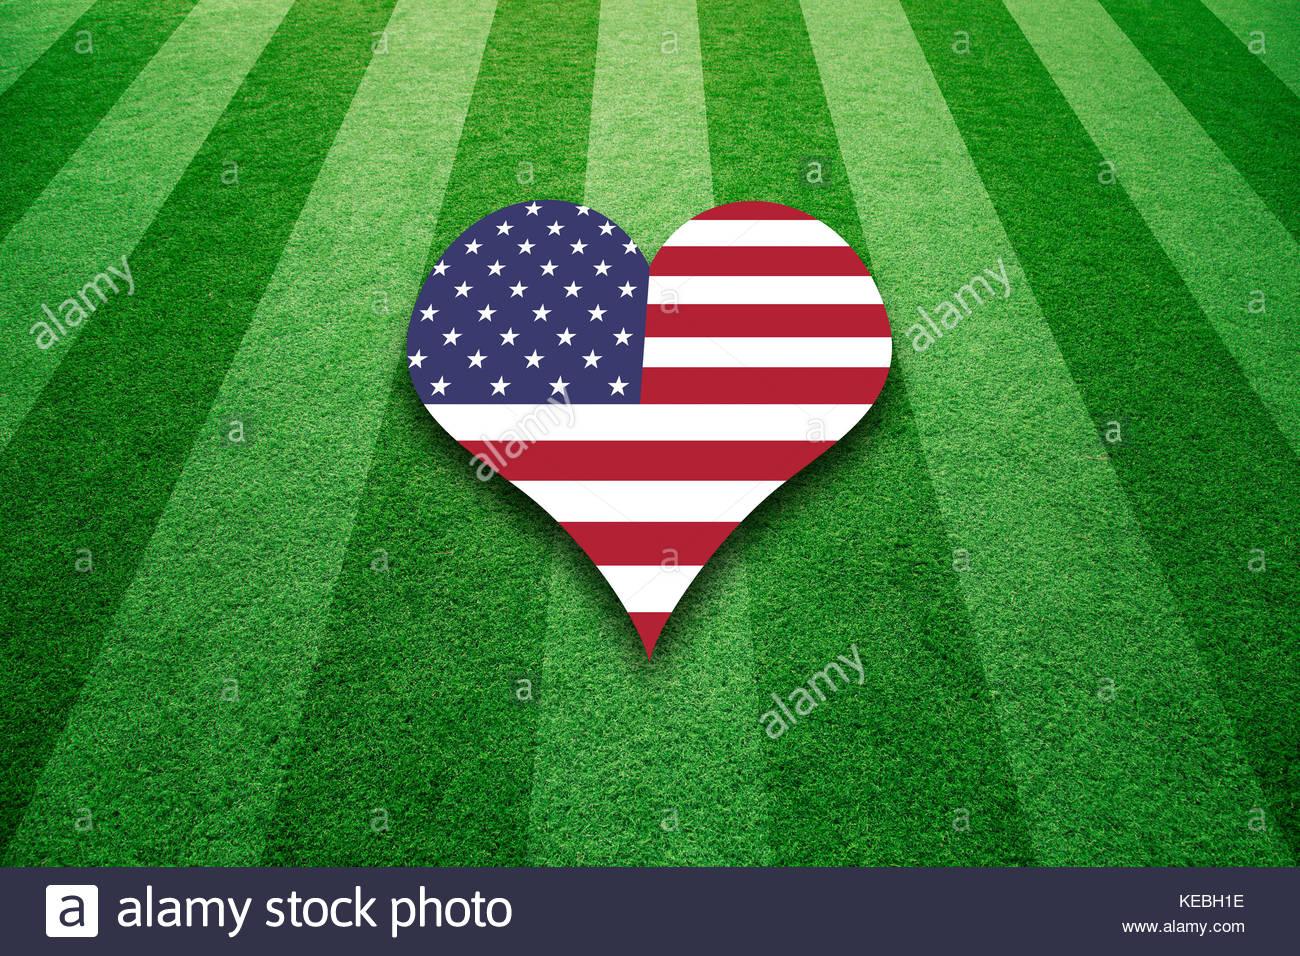 Sunny american football artificial green grass field with united sunny american football artificial green grass field with united states flag colors love heart symbol background biocorpaavc